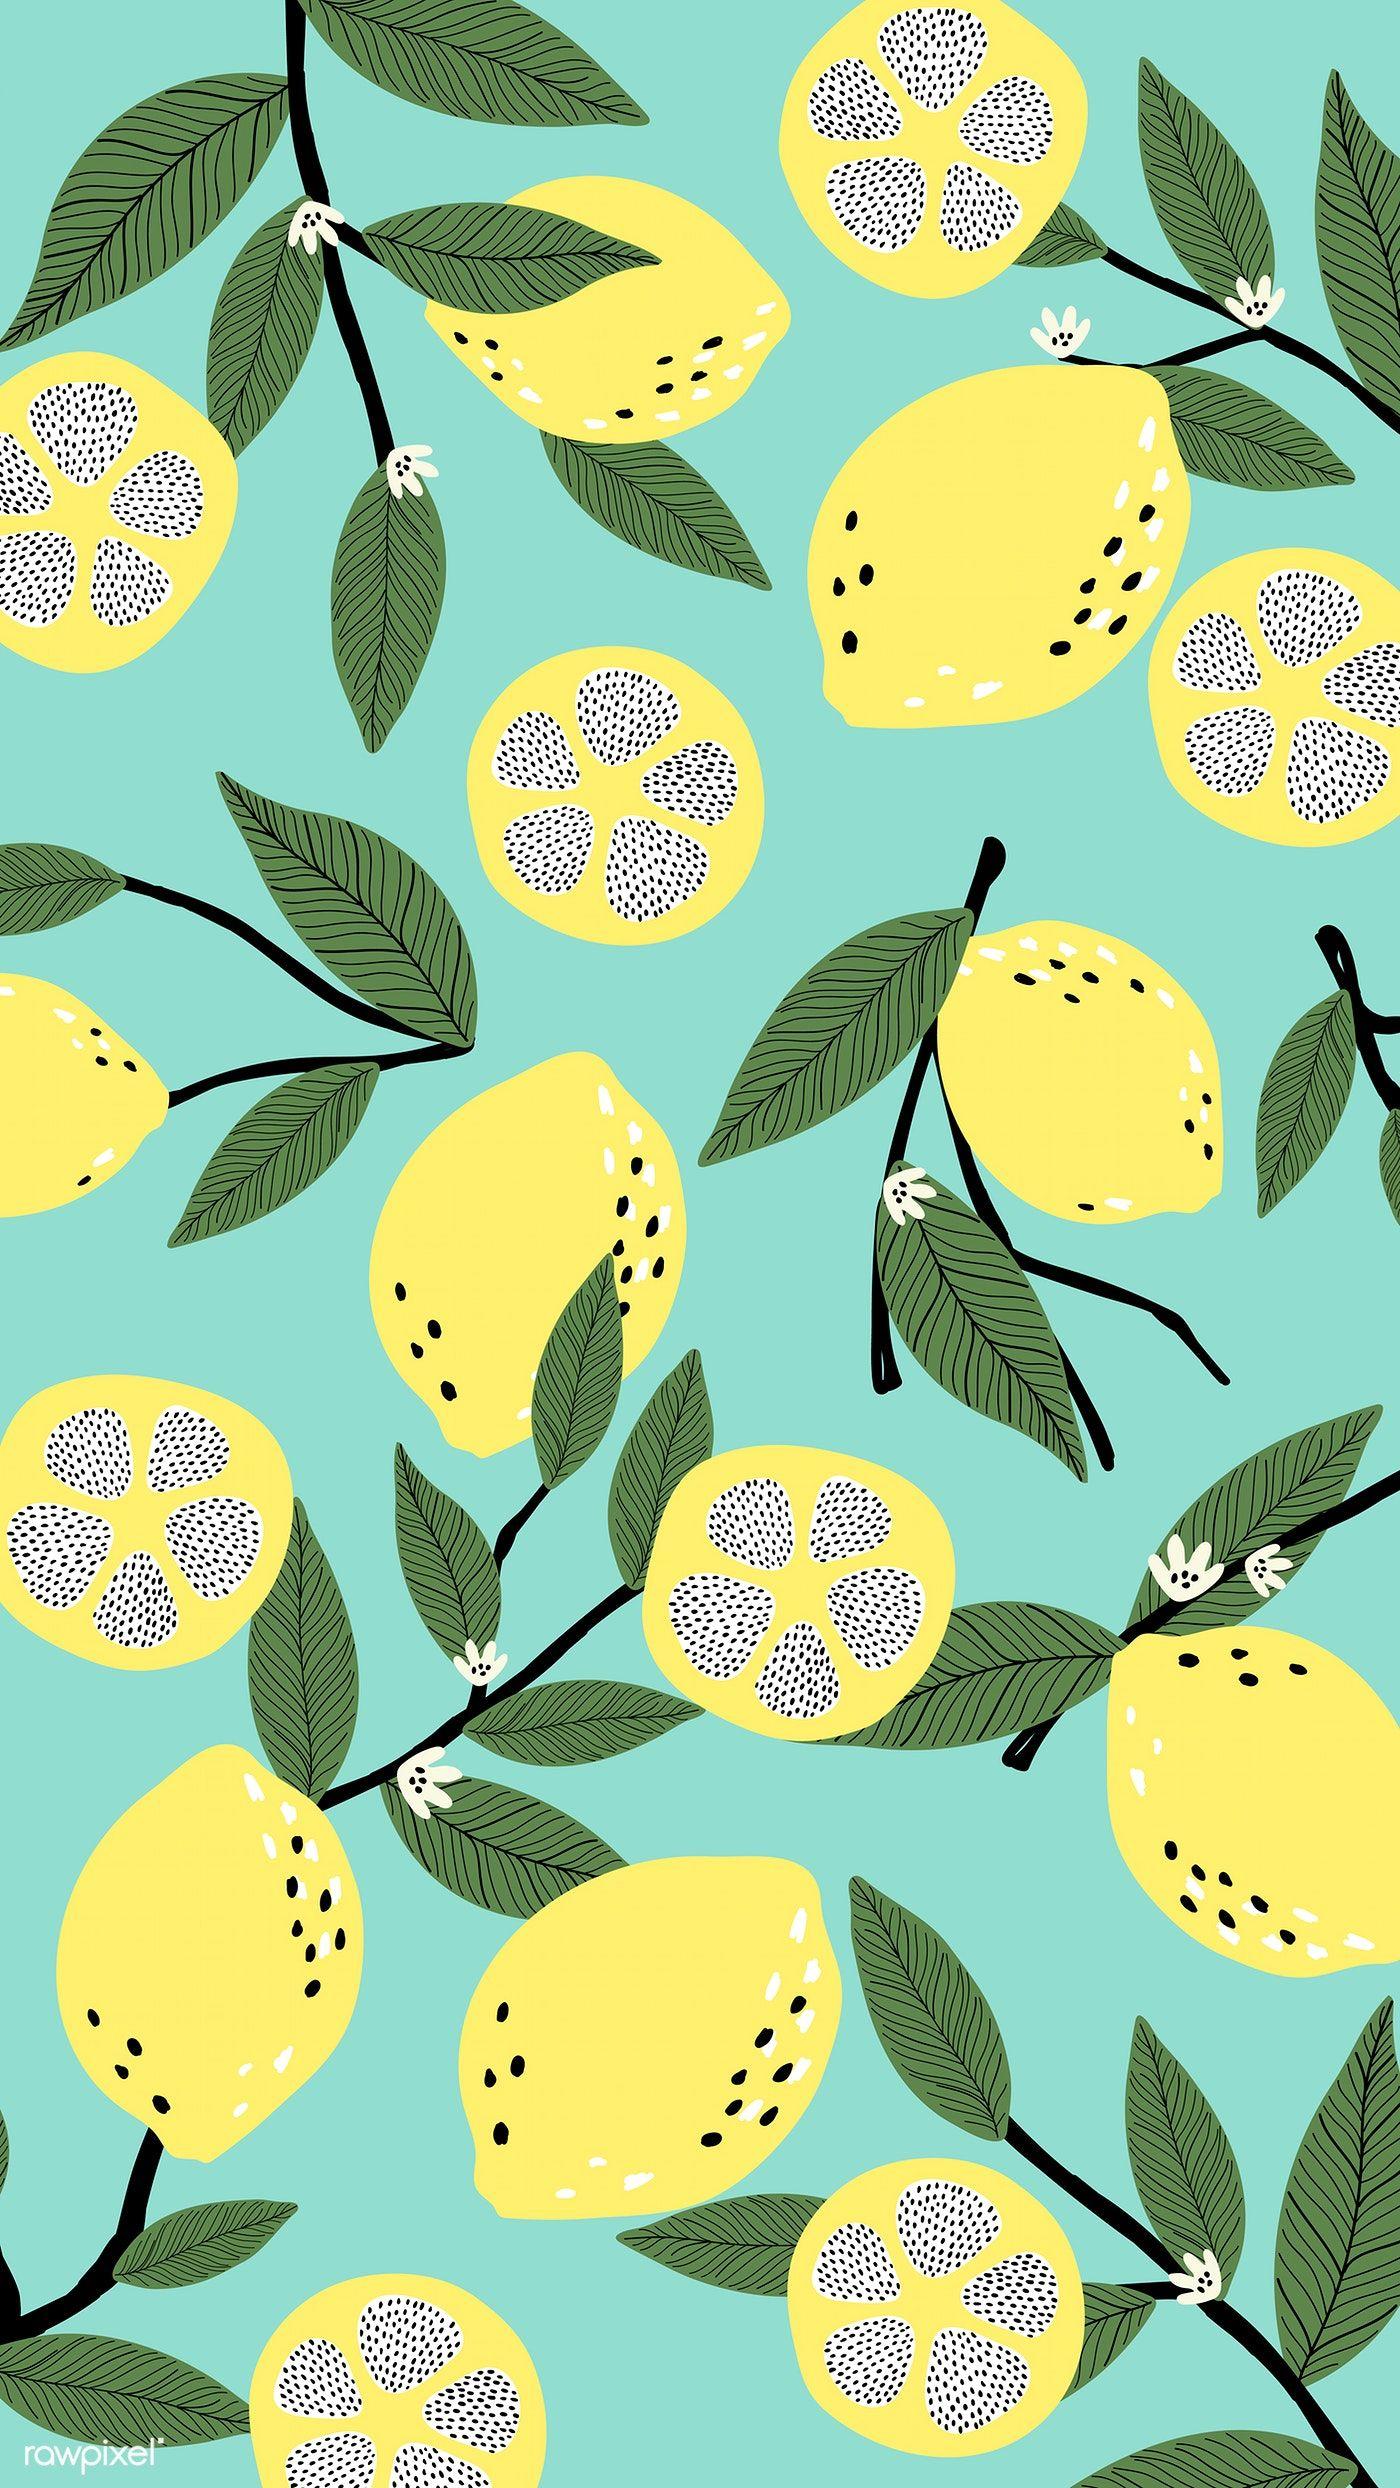 100 Download Premium Vector Of Lemon Patterned Blue Background Vector 893018 Wallpapers